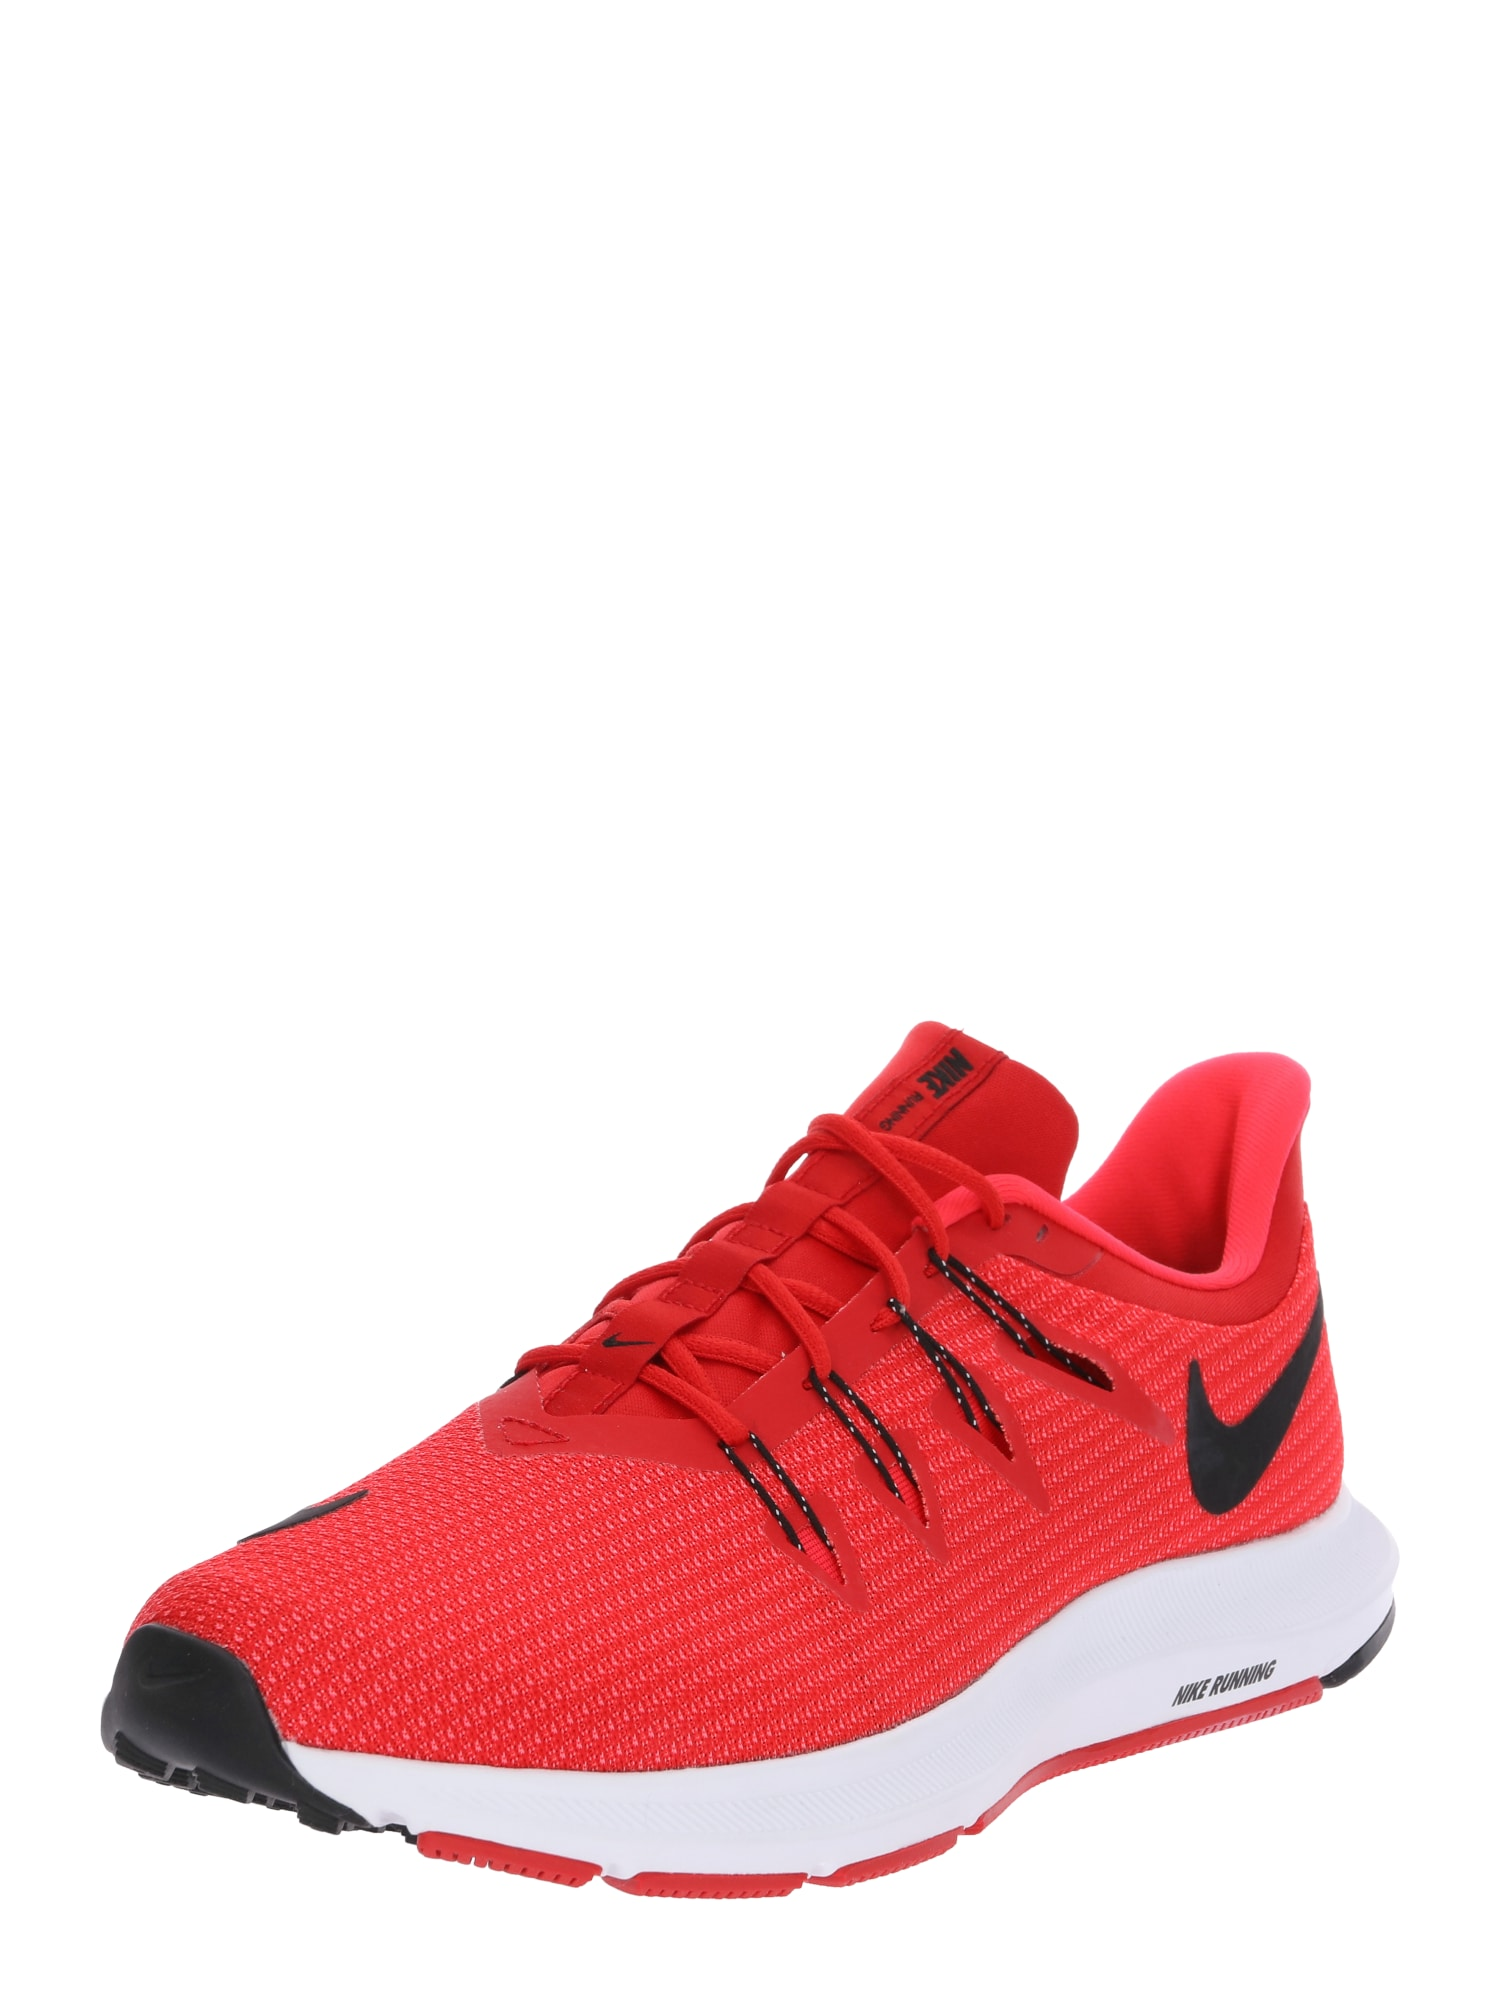 Běžecká obuv QUEST červená černá bílá NIKE